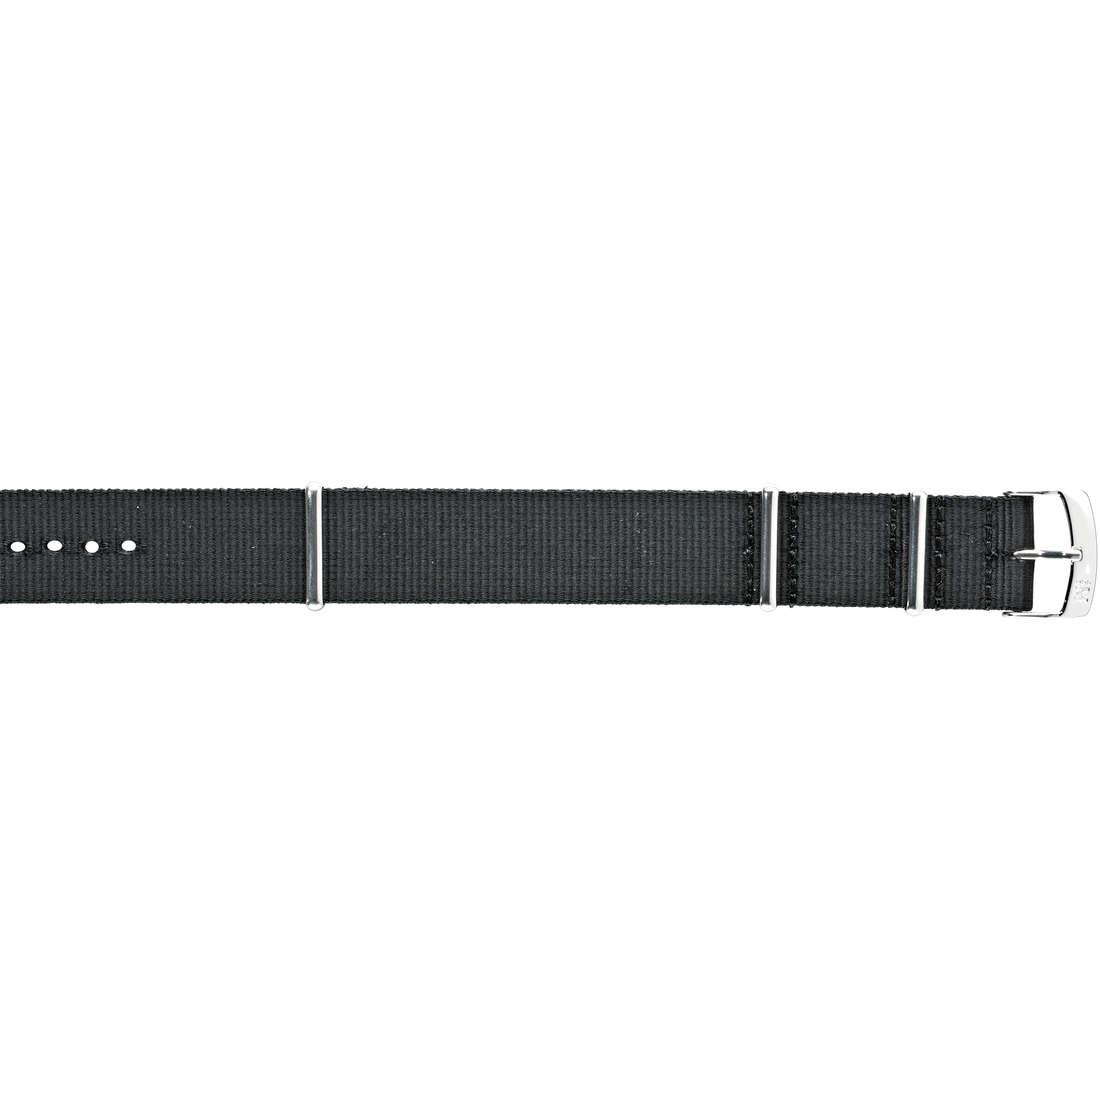 watch watch bands watch straps man Morellato Morellato 1930 A01U3972A74019CR20